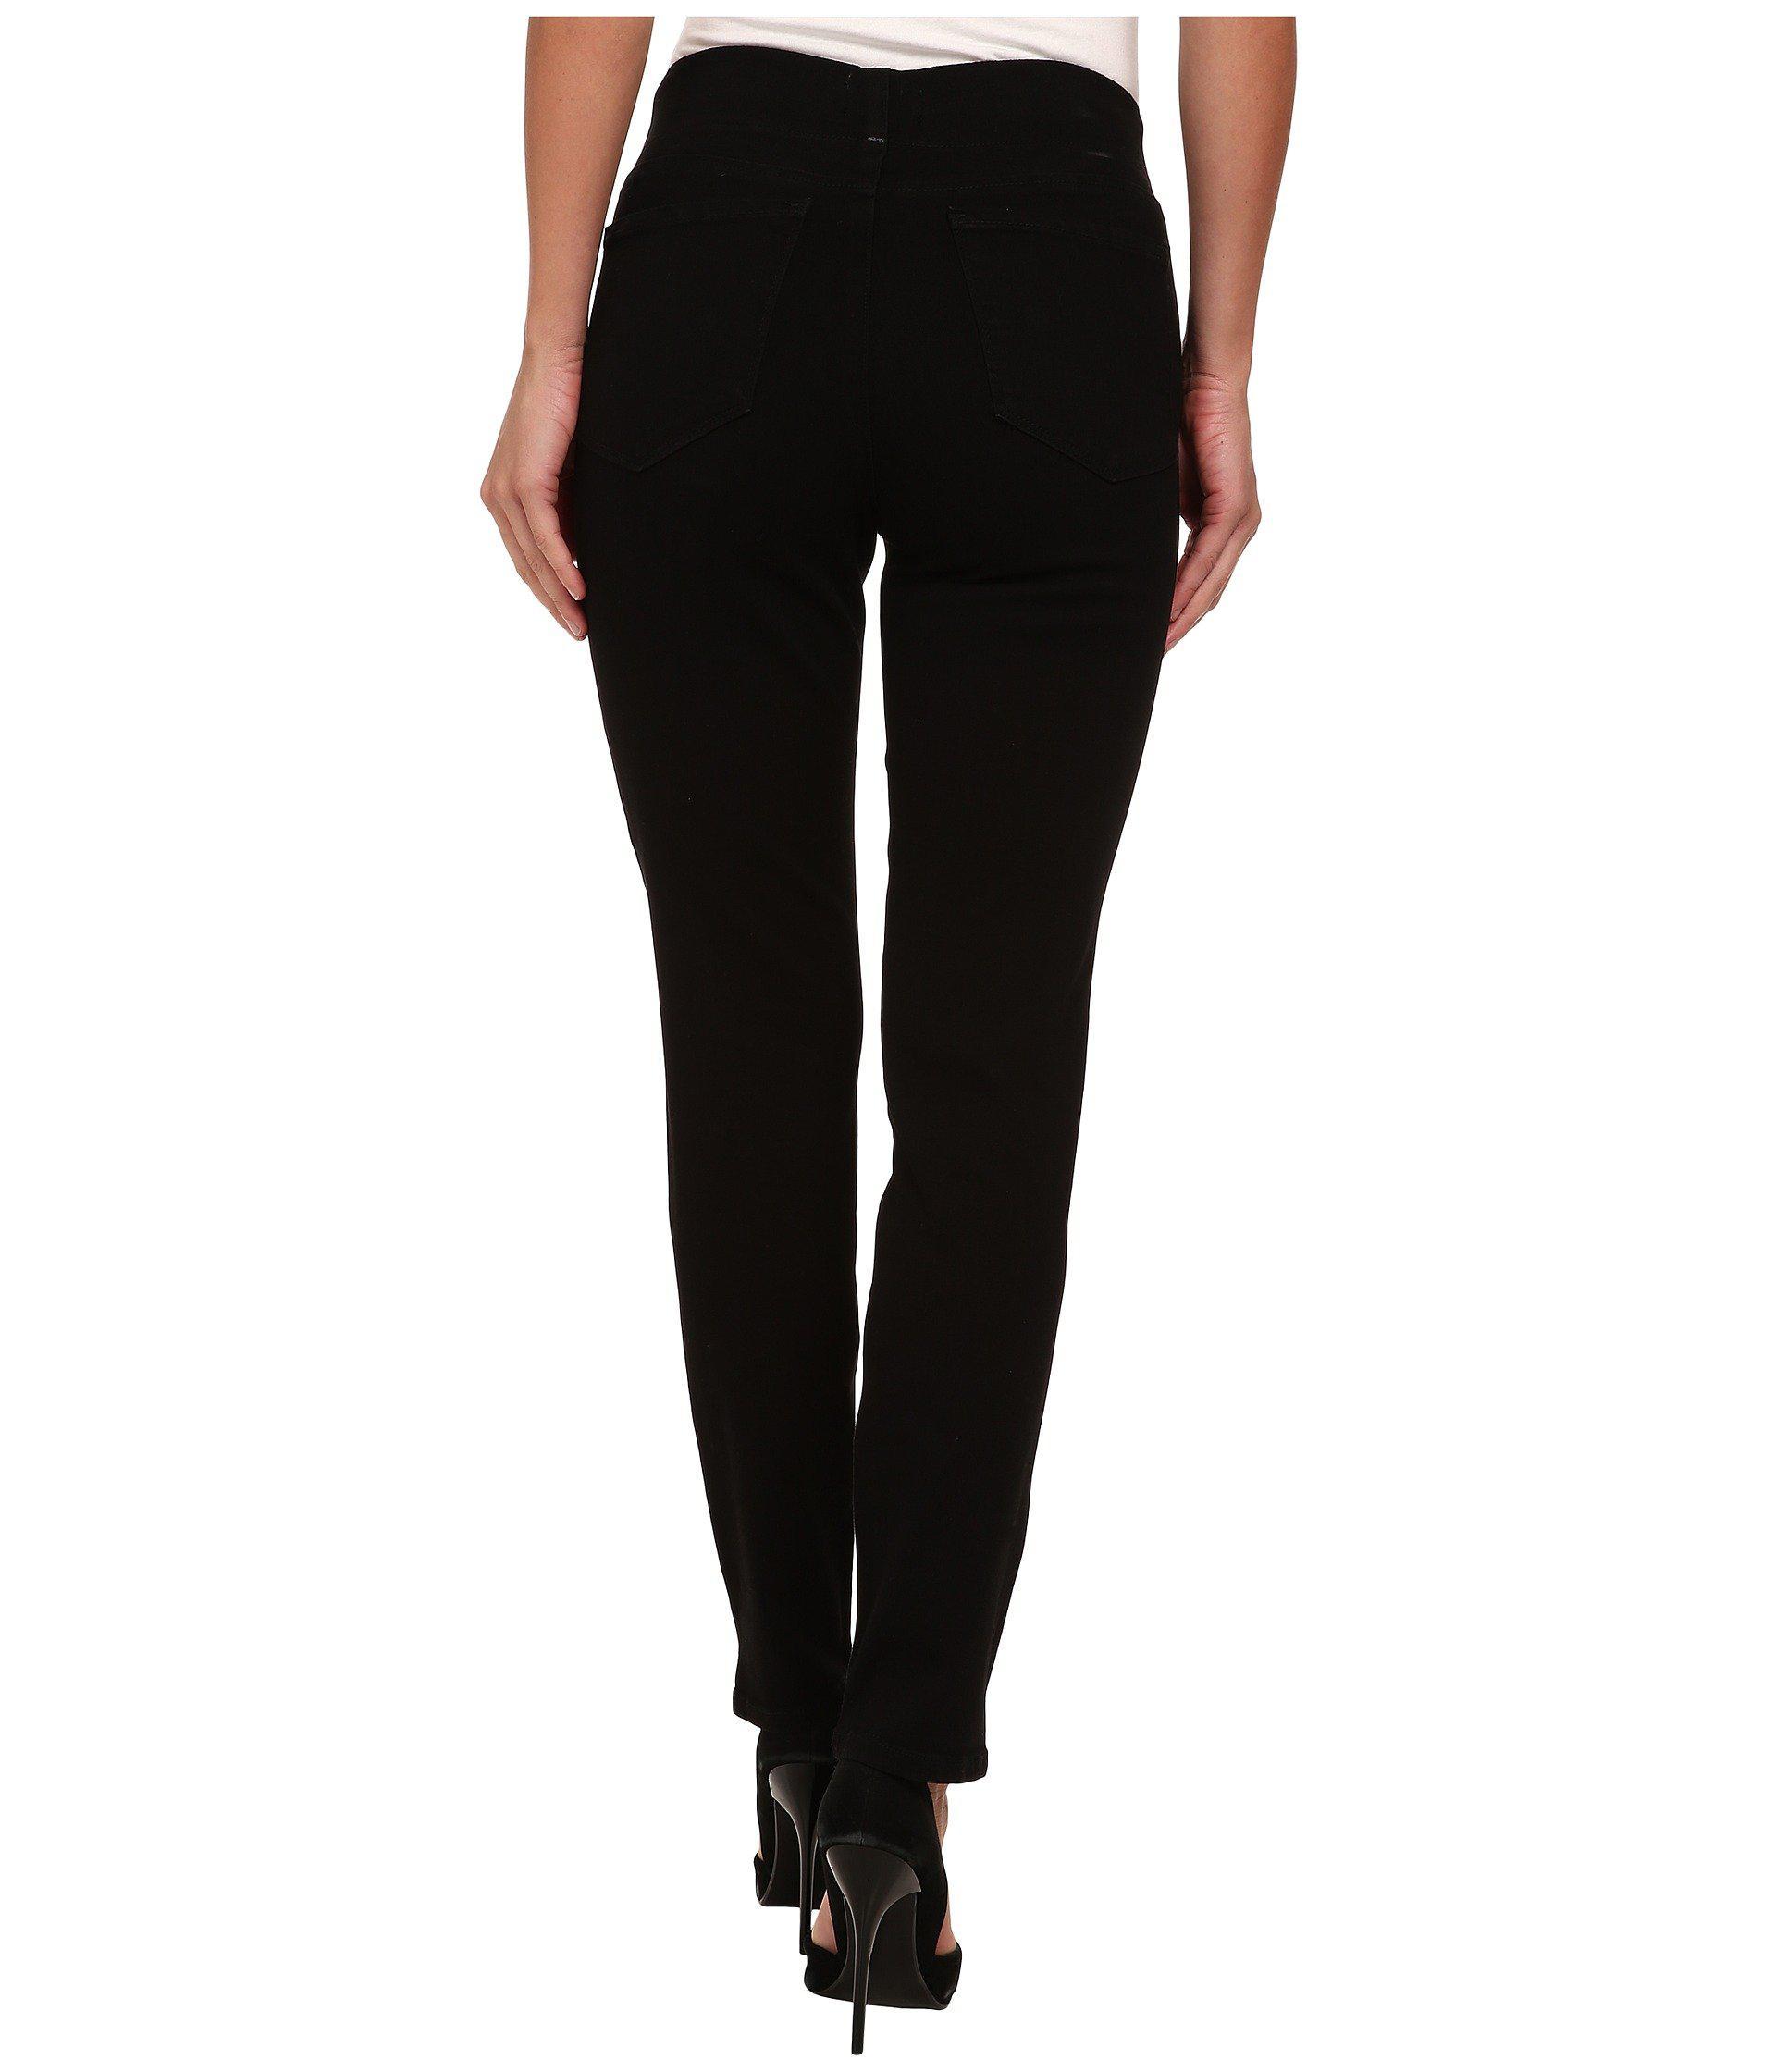 4b7b5781361 NYDJ - Alina Pull On Ankle In Black (black) Women s Jeans - Lyst. View  fullscreen